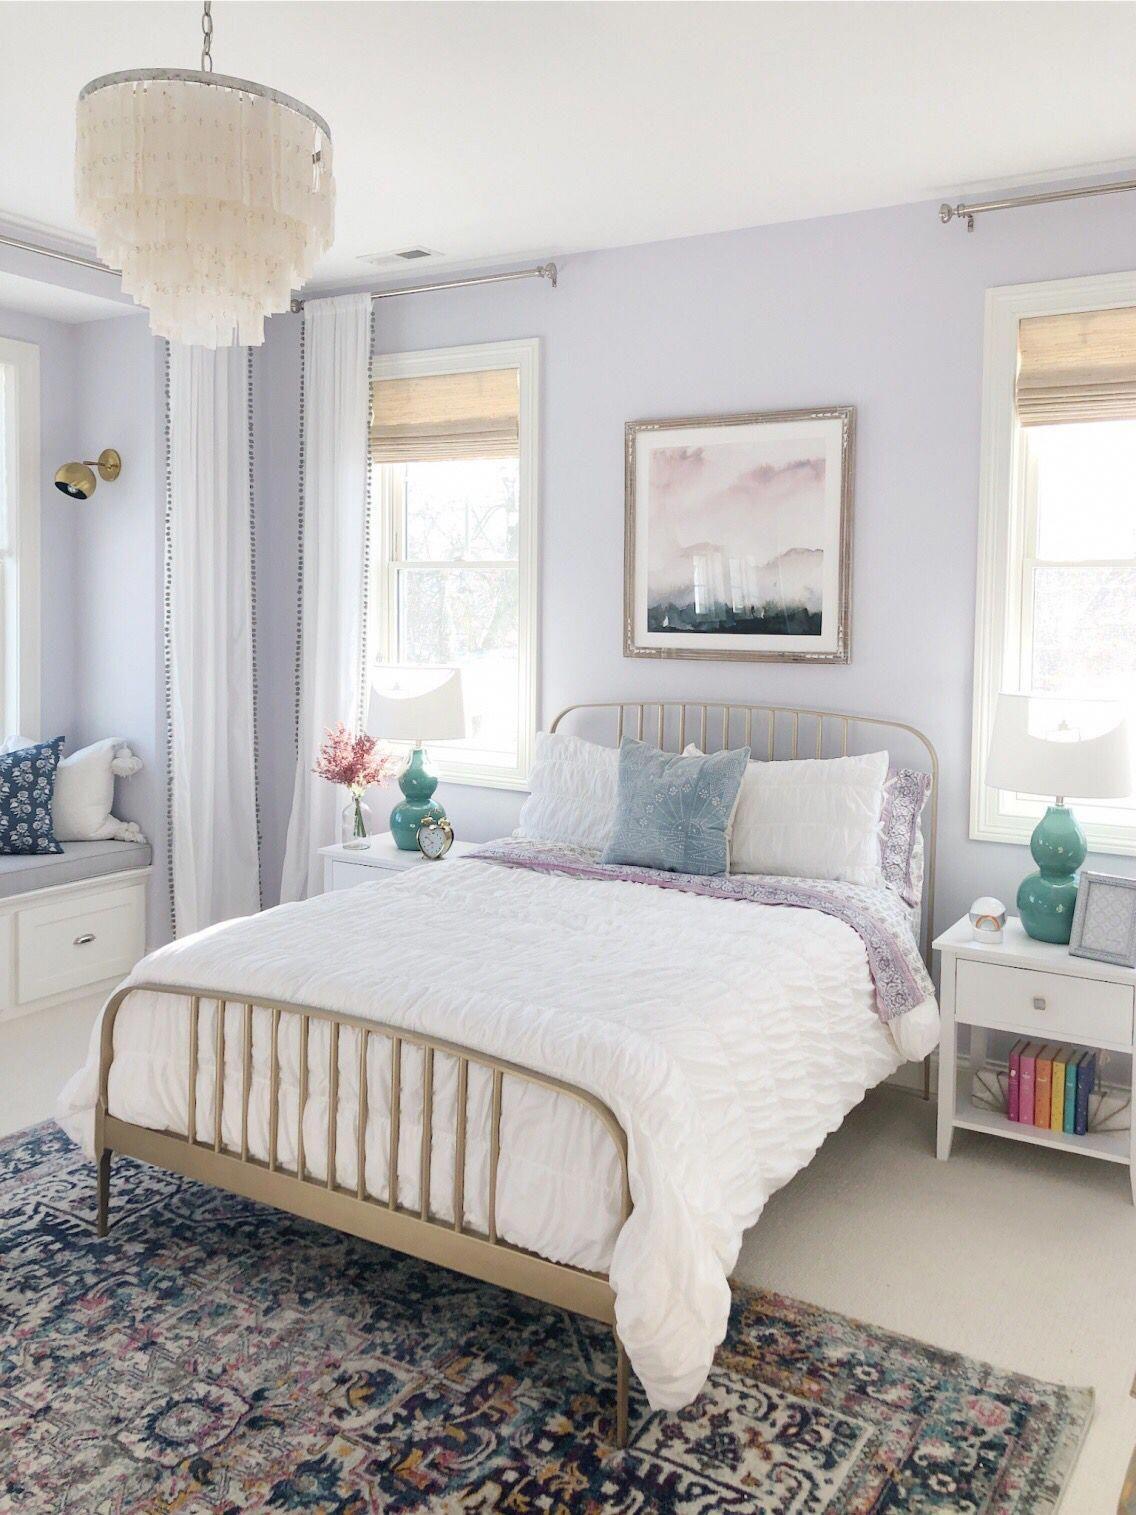 Meubles Luxe Chambre Interieurluxemoderne Deco Chambre